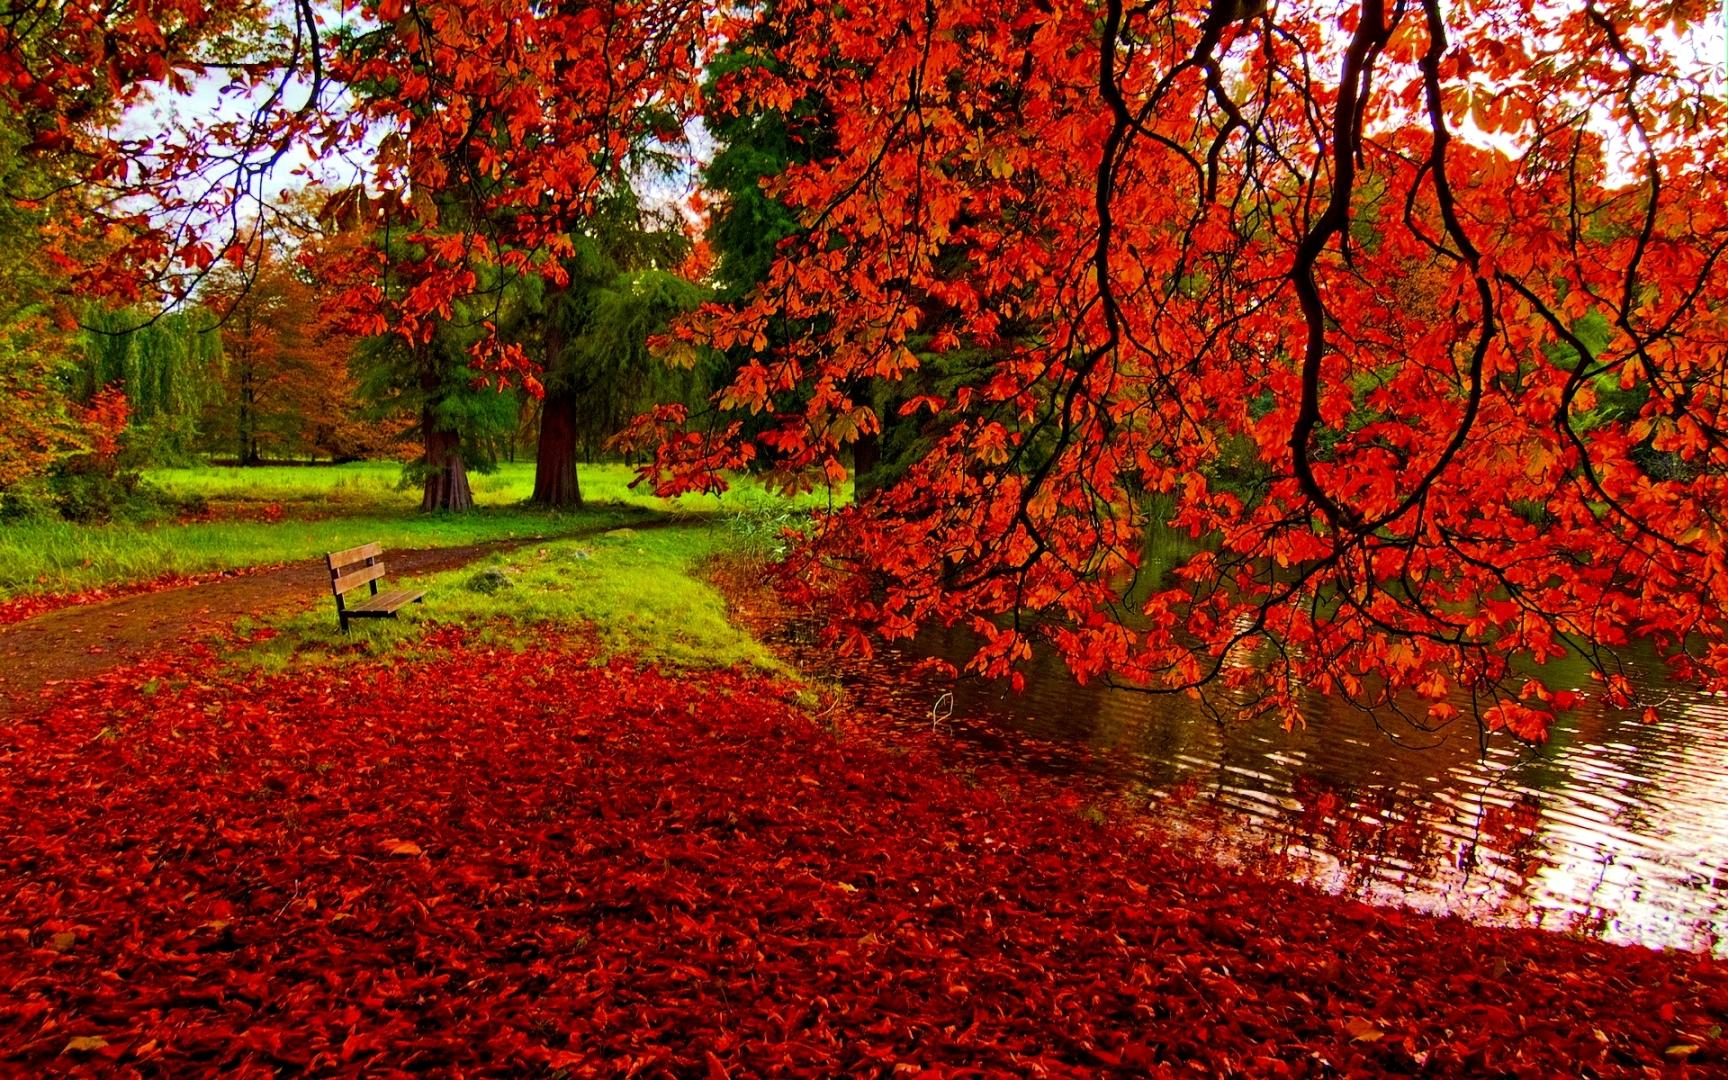 Fall-Foliage-HD-Wallpaper